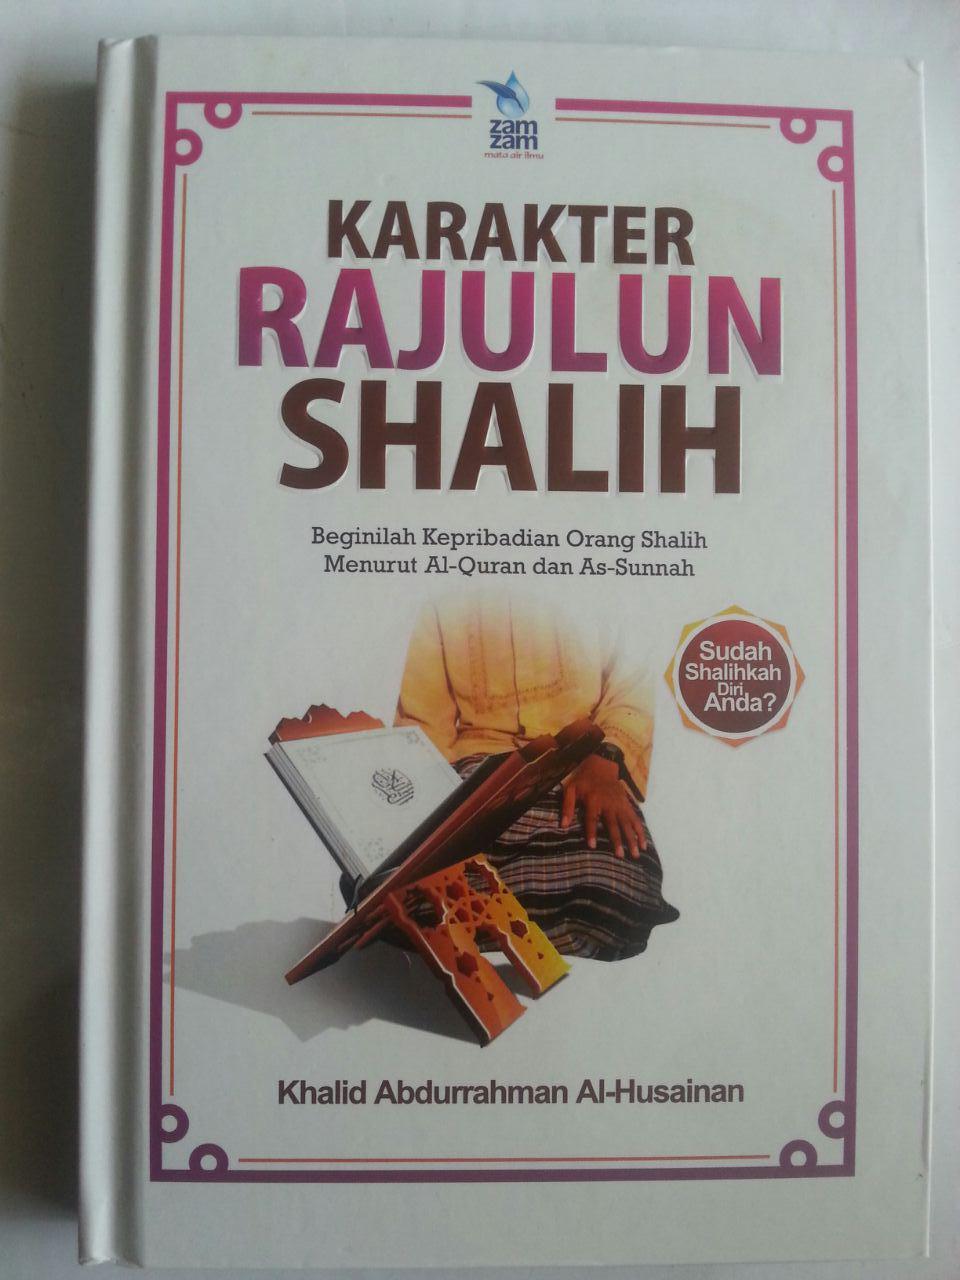 Buku Karakter Rajulun Shalih Kepribadian Menurut Quran Sunnah cover 2